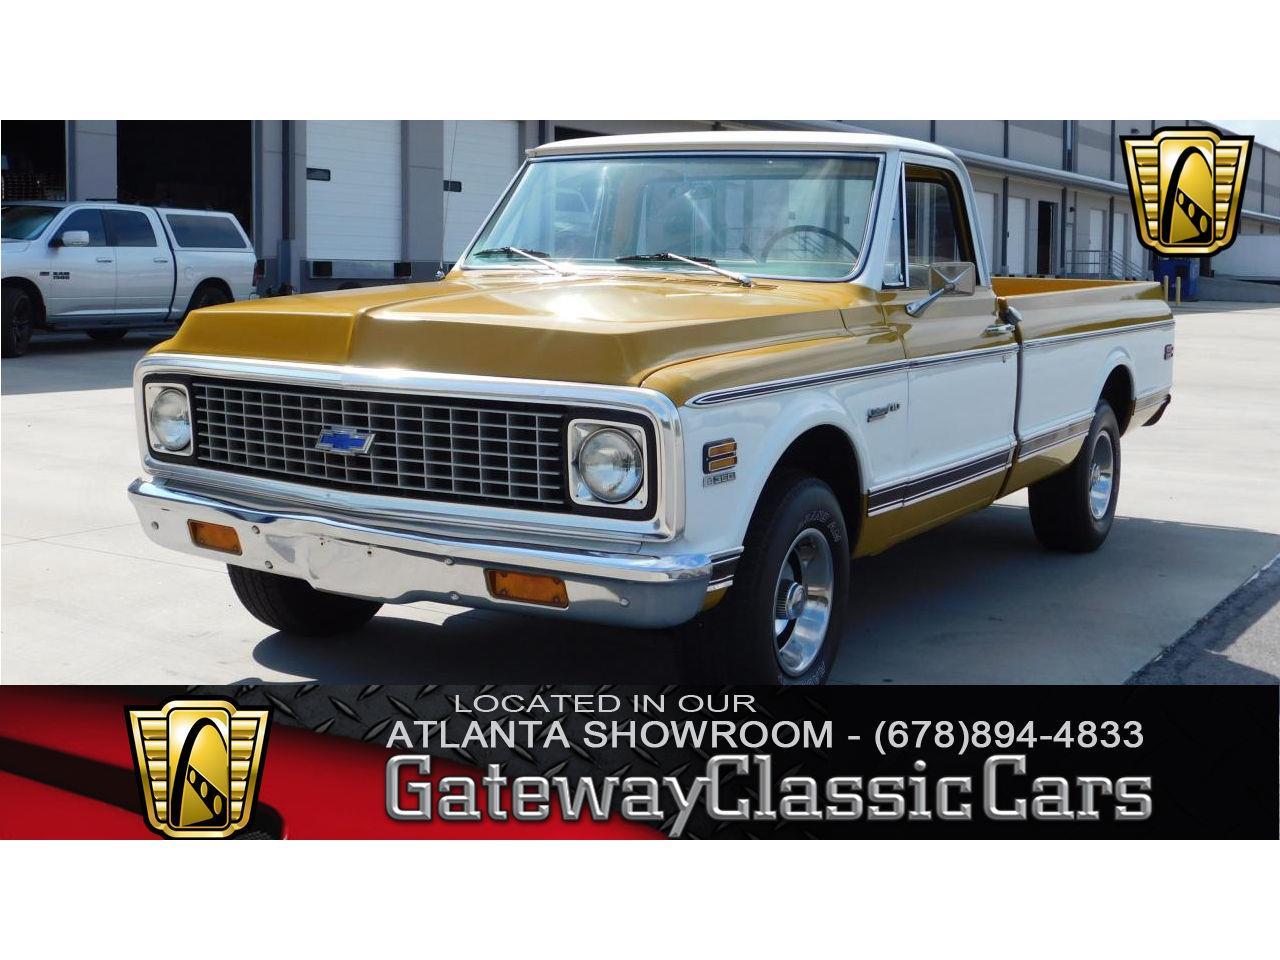 For Sale: 1971 Chevrolet C10 in Alpharetta, Georgia